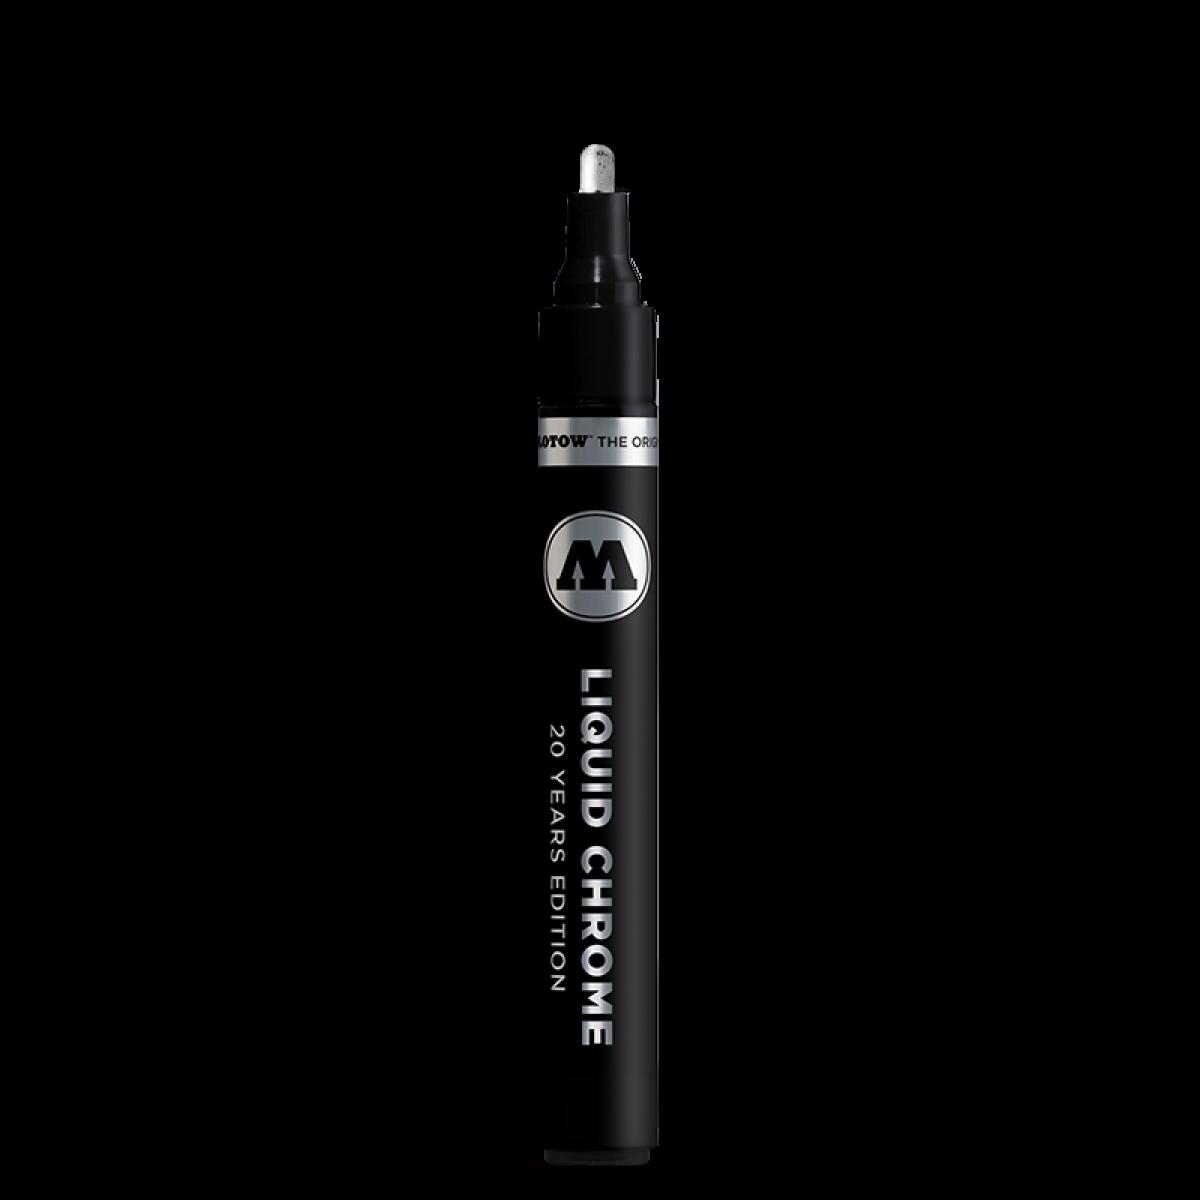 MolotowLiquidChromePumpMarker-01